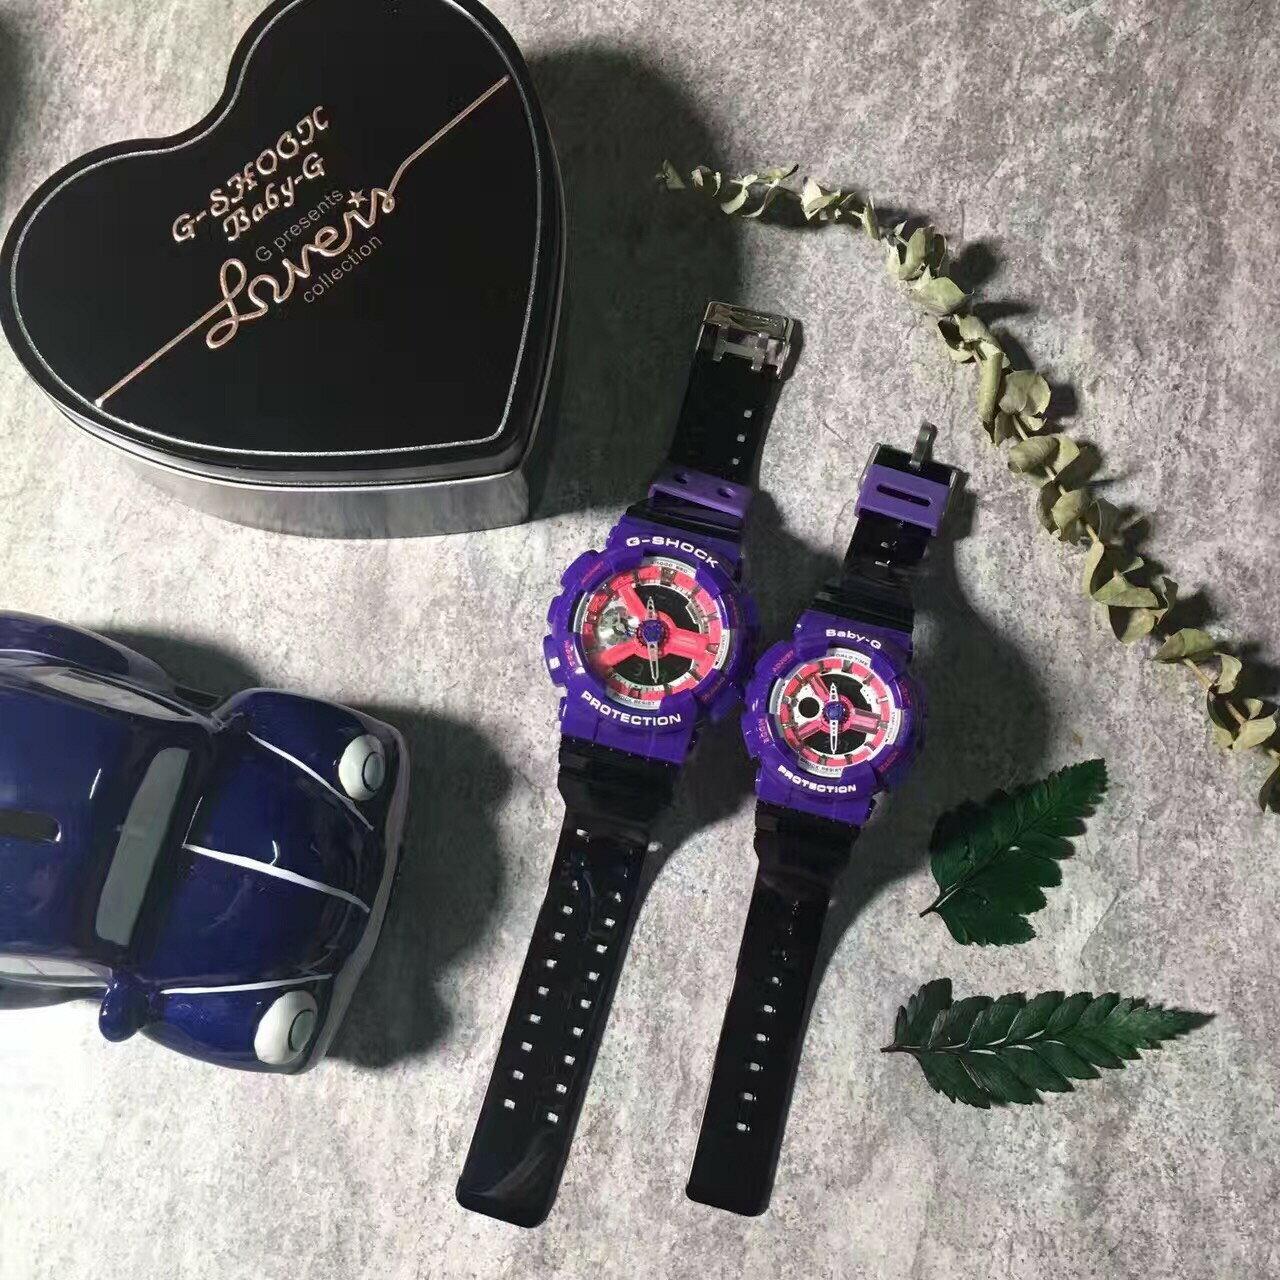 國外代購CASIO G-SHOCK GA110NC & BABY-G BA110NC 情侶對錶 雙顯 防水手錶